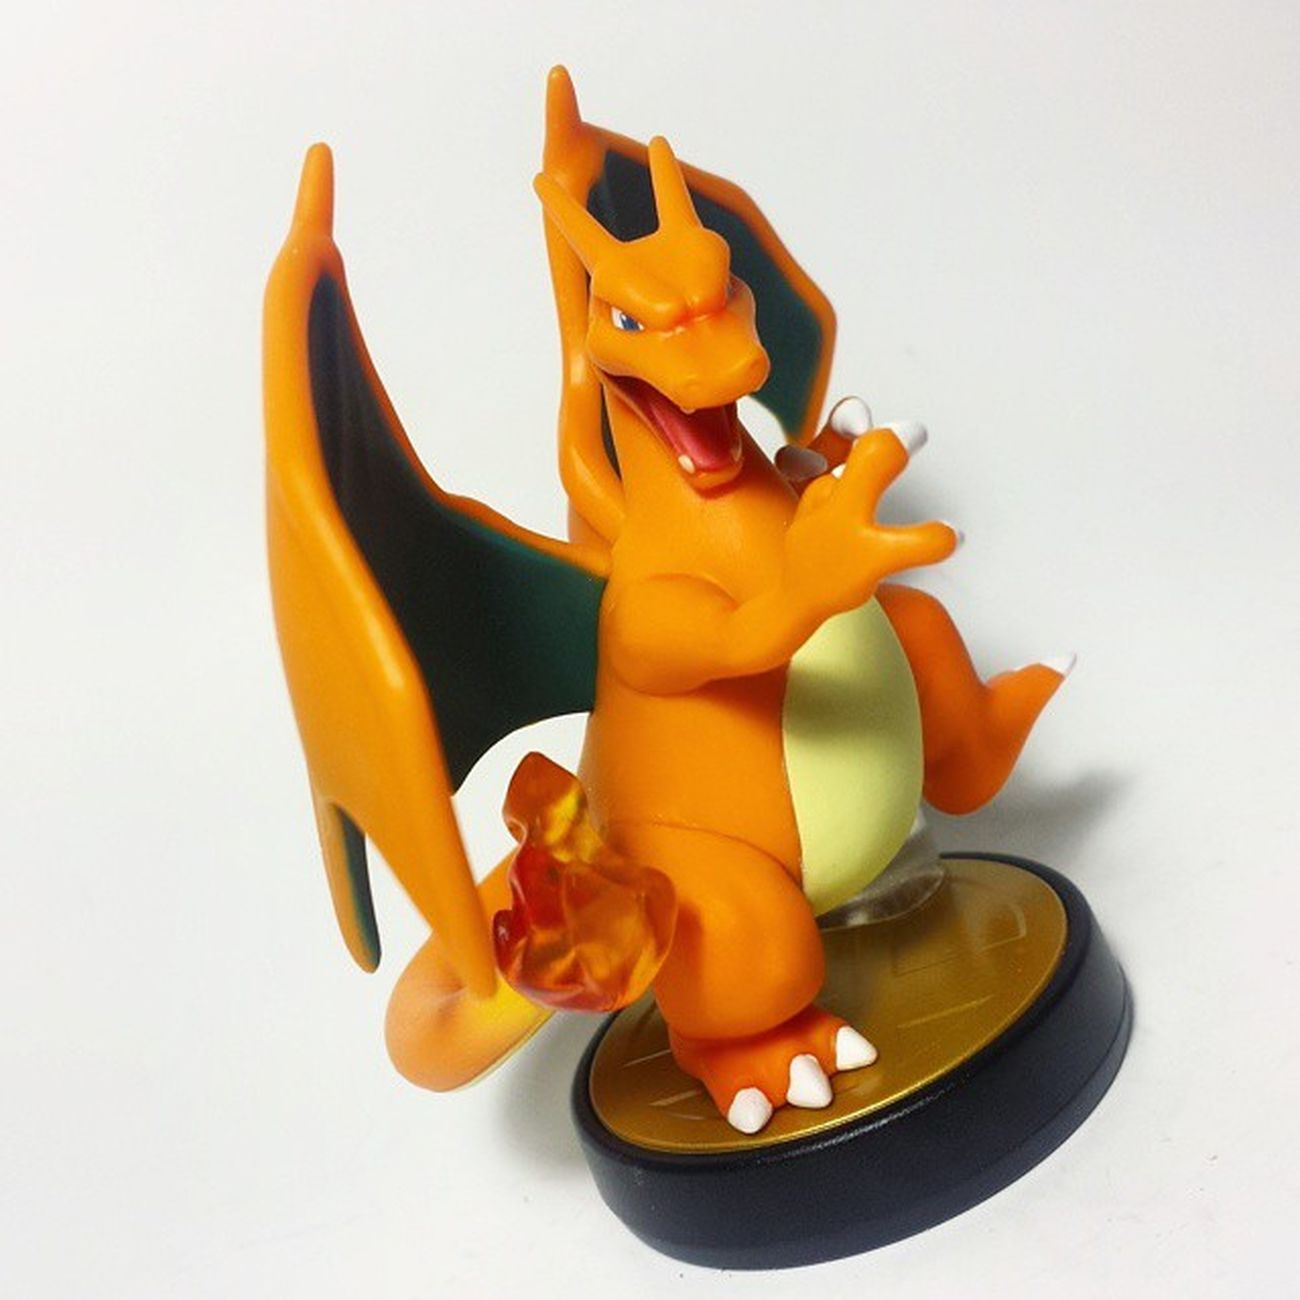 Charizard Pokémon GottaCatchEmAll Anime Nintendo Nintendofan Amiibo SuperSmashBros 3DS WiiU Toys Toyphotography Toypizza Toysarehellasick Toycollector Toycommunity Toycollection